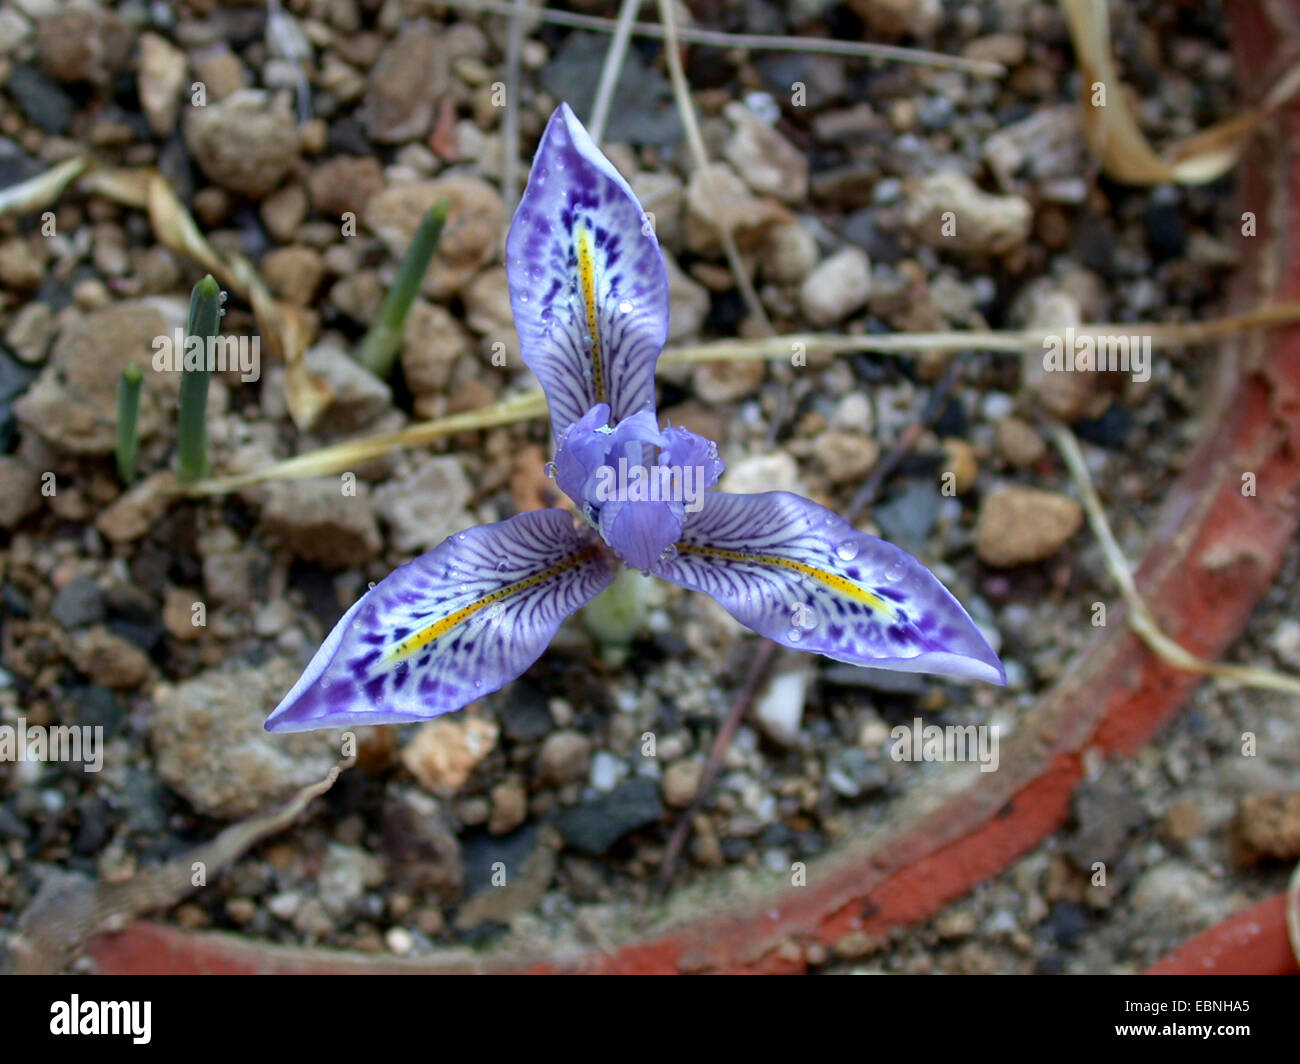 Histrio iris (Iris histrio), flower - Stock Image